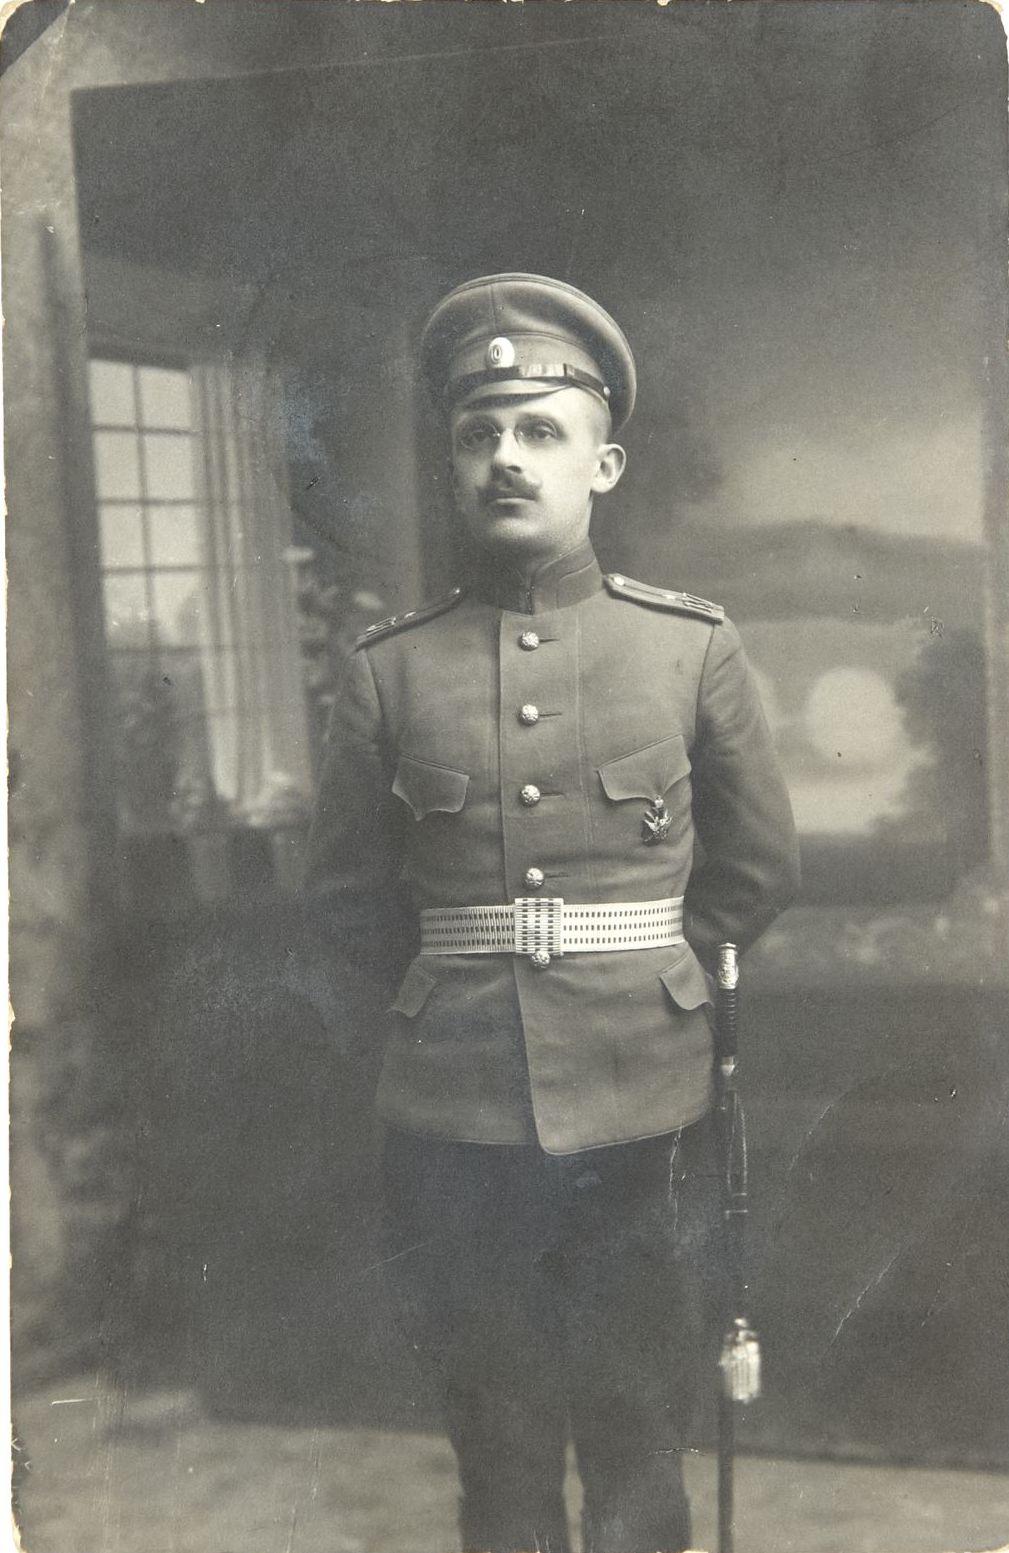 1916. Фото прапорщика 137-го пехотного Нежинский полка А. Иванова